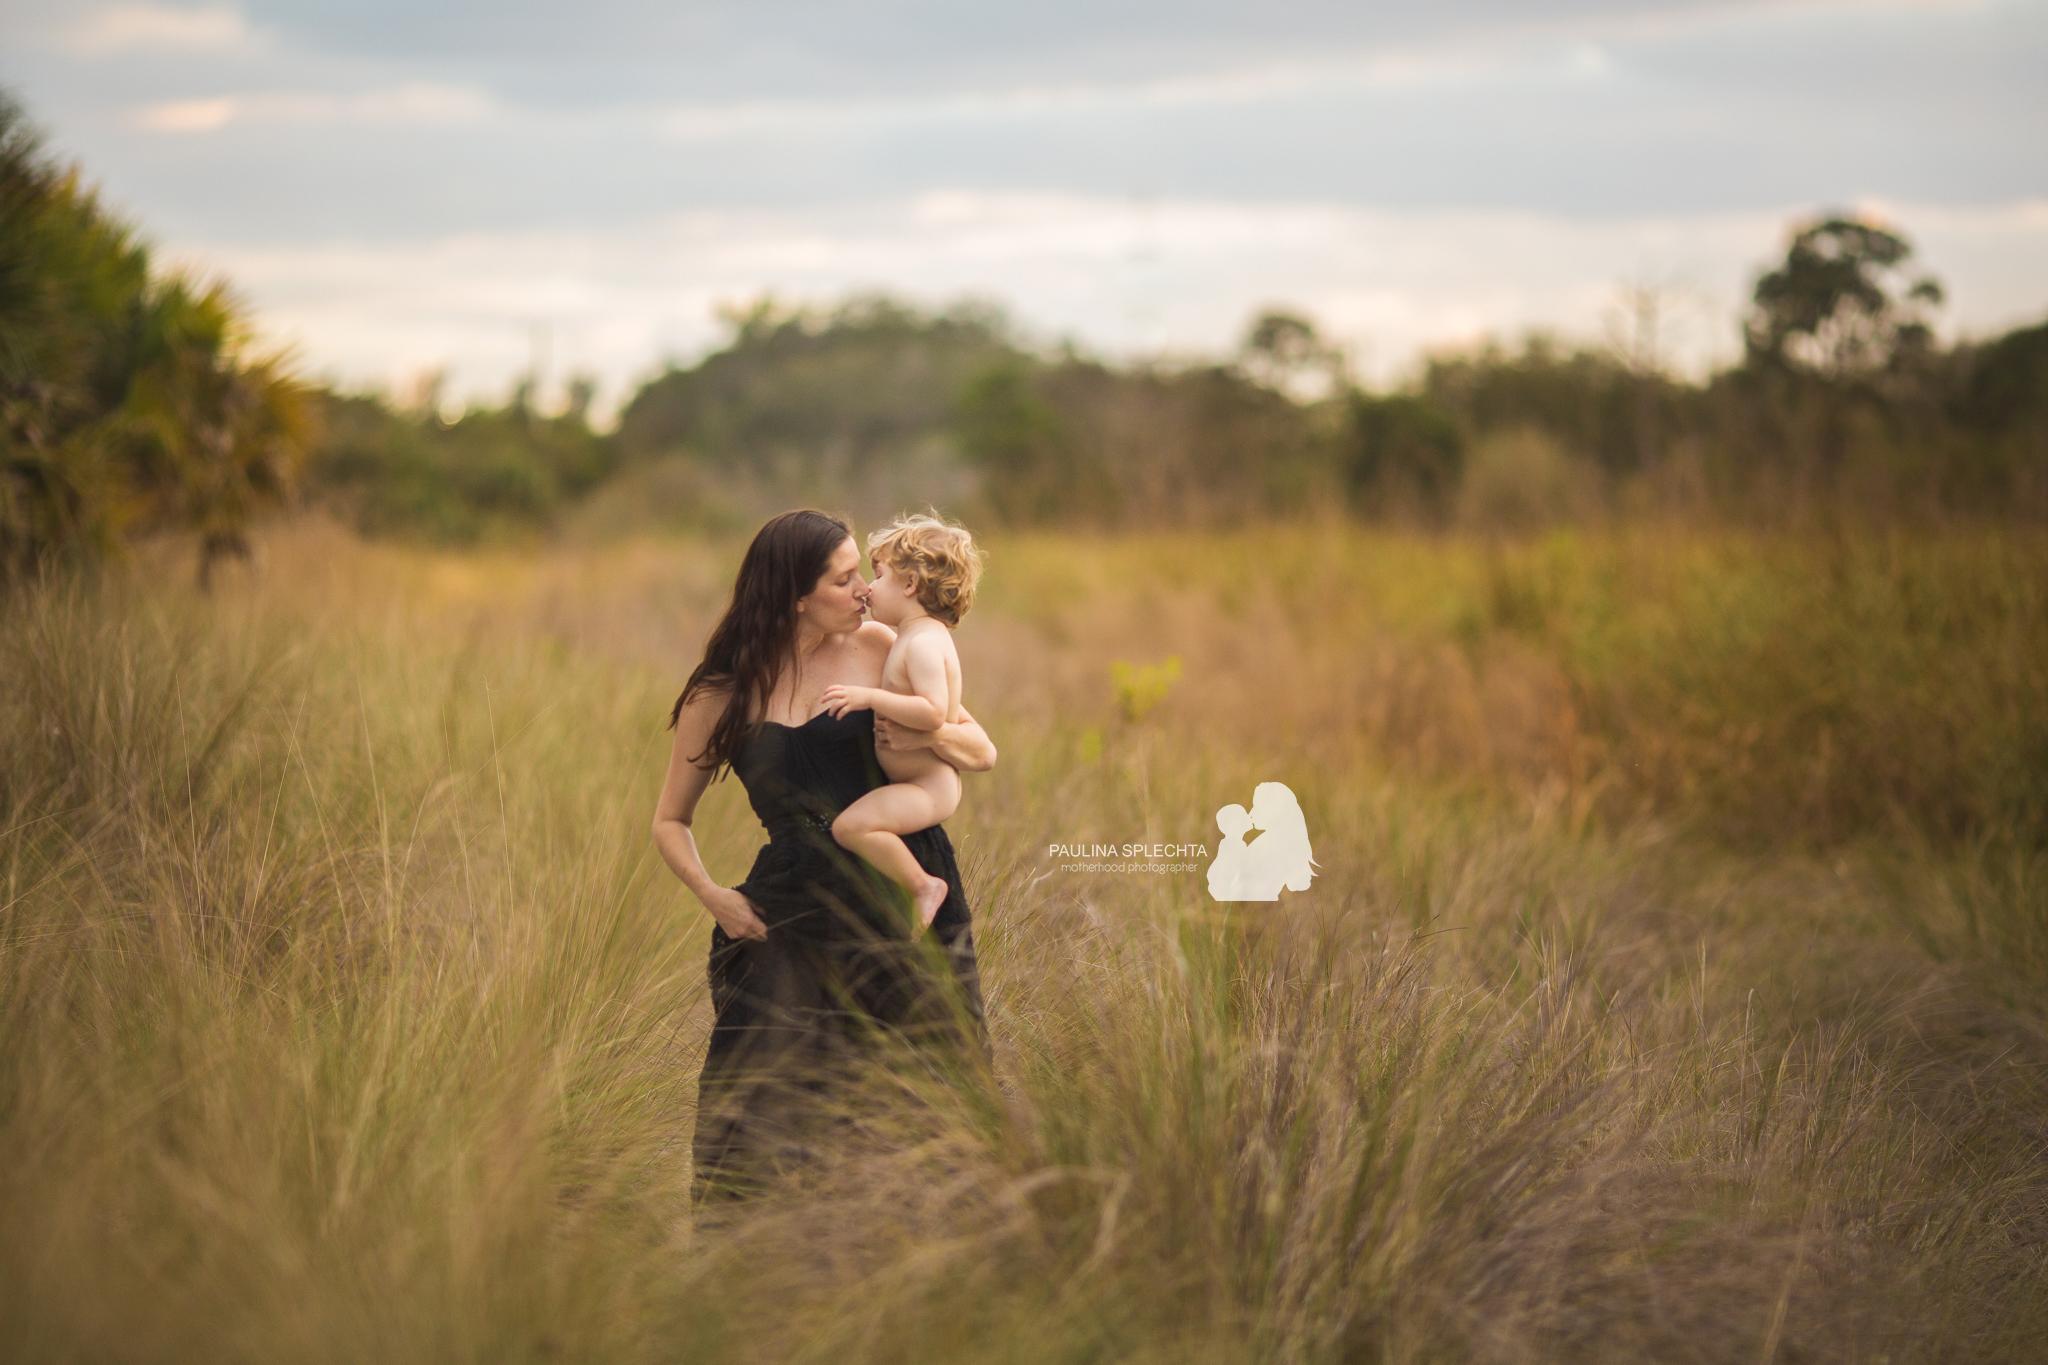 paulina-splechta-boca-birth-photographer-bocabirthphotographer-south-florida-birth-photographer-maternityphotographer-pregnancy-motherhood-12.jpg